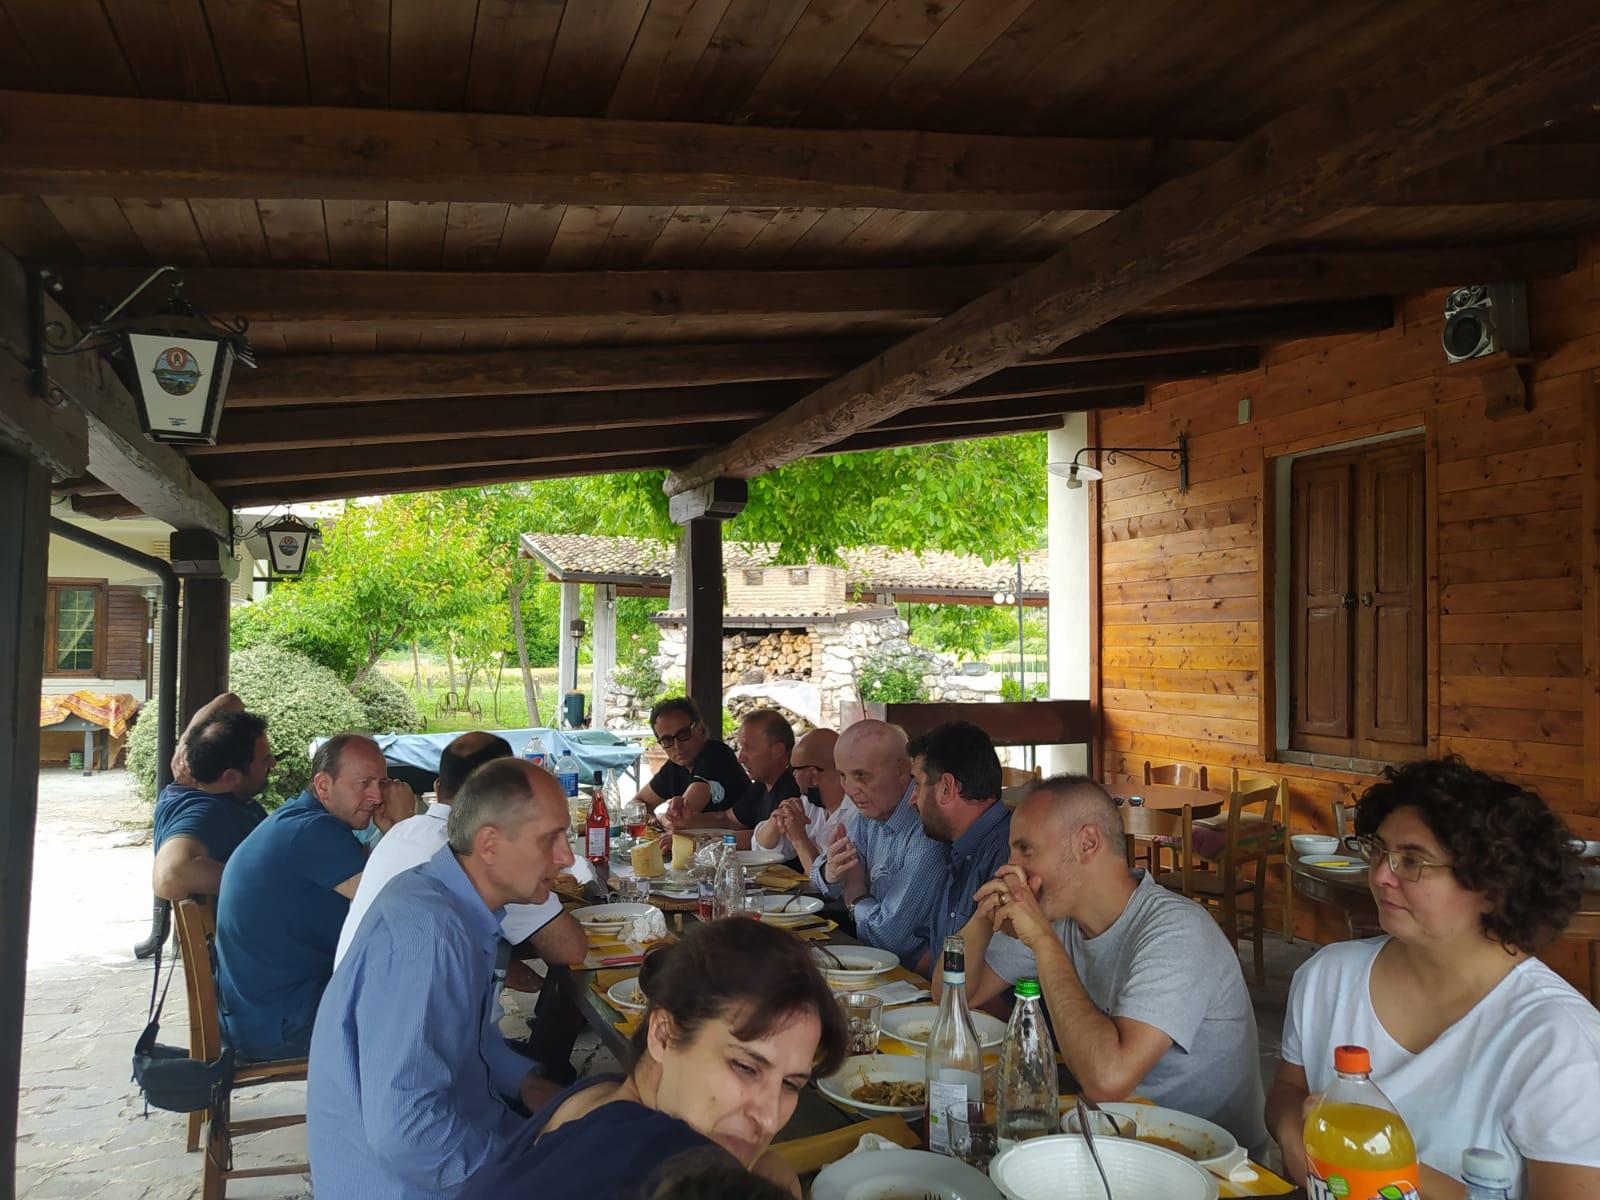 Da Zeppa Tavern a Casali d'Aschi, Gioia dei Marsi (AQ)